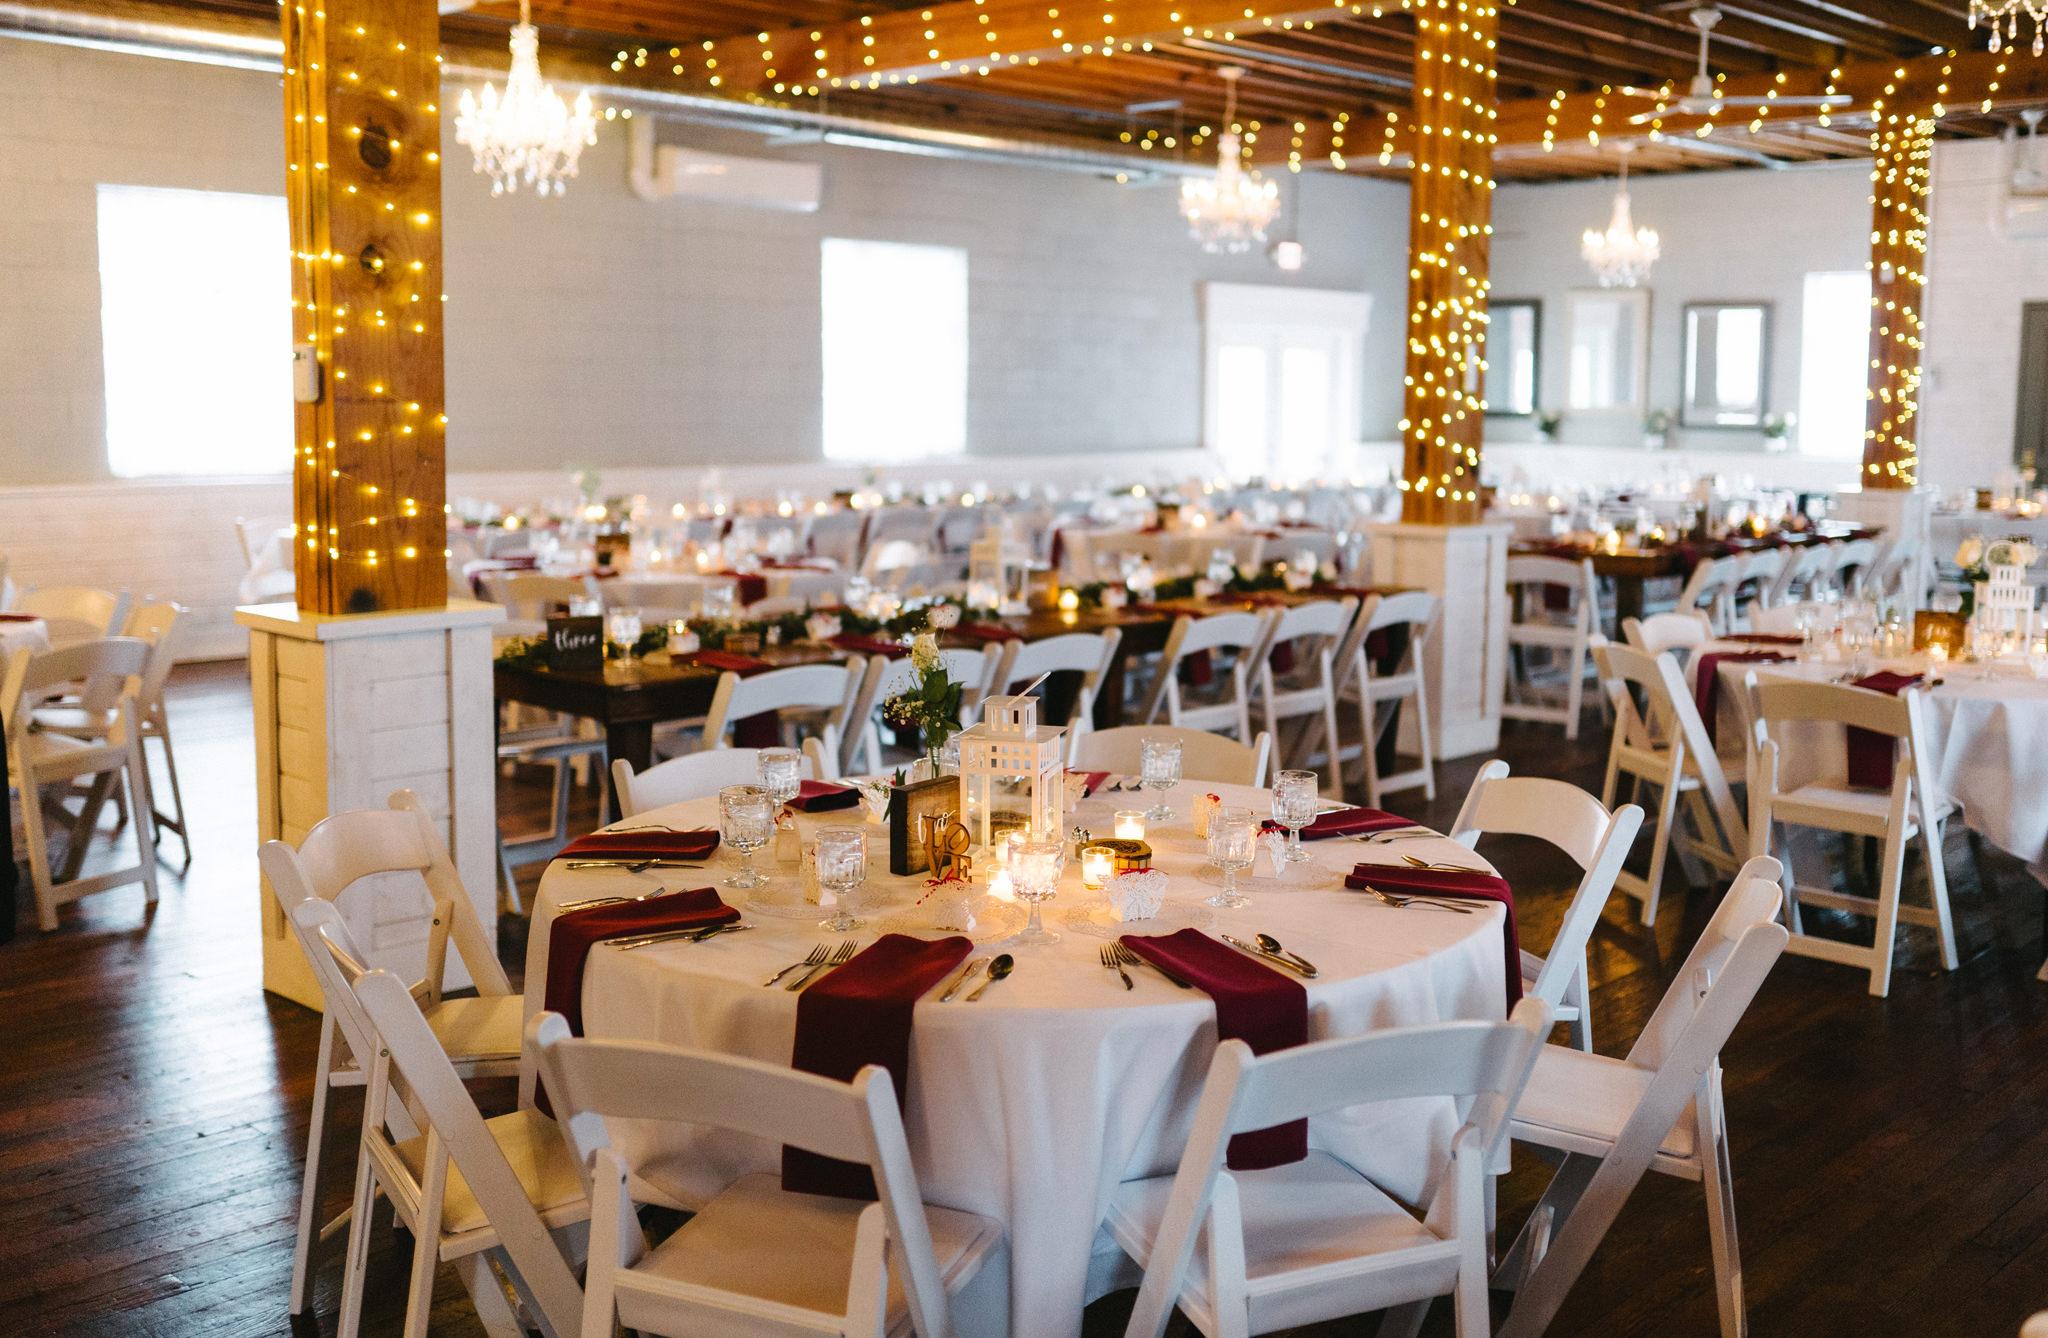 035-rempel-photography-chicago-wedding-inspiration-susan-daniel-michigan-metro-detroit-christian-church-holly-vault-cupcakes-and-kisses.jpg